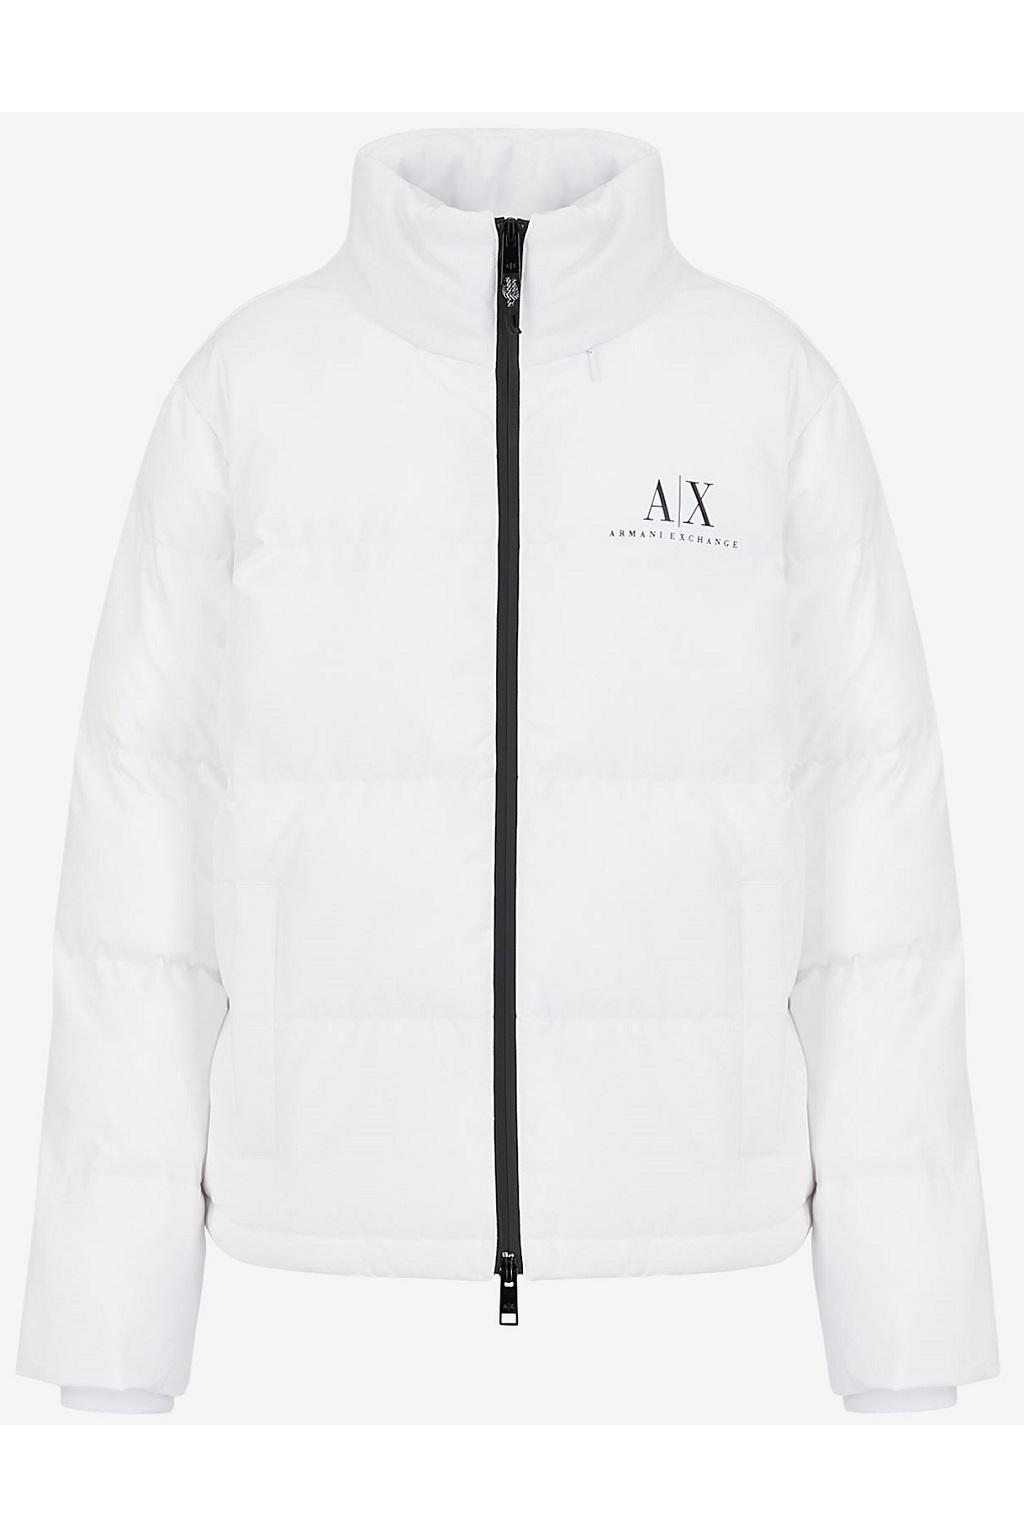 Dámská bunda Armani Exchange 6KYB11 YNTUZ bílé